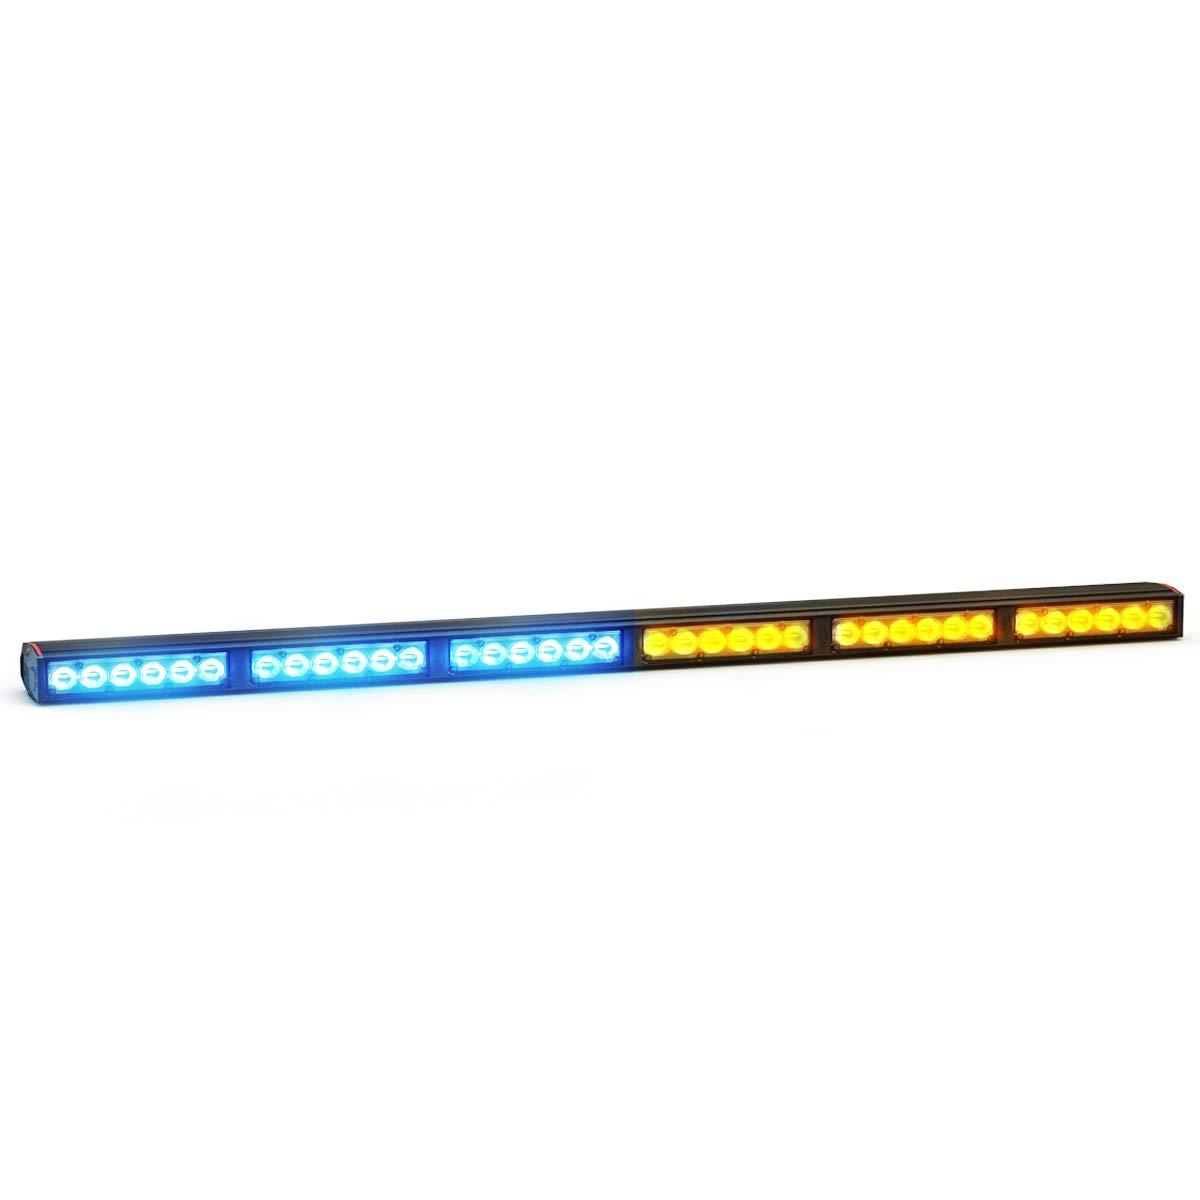 Feniex Fusion 600 Single Color LED Lightstick 40/° Optics, Blue